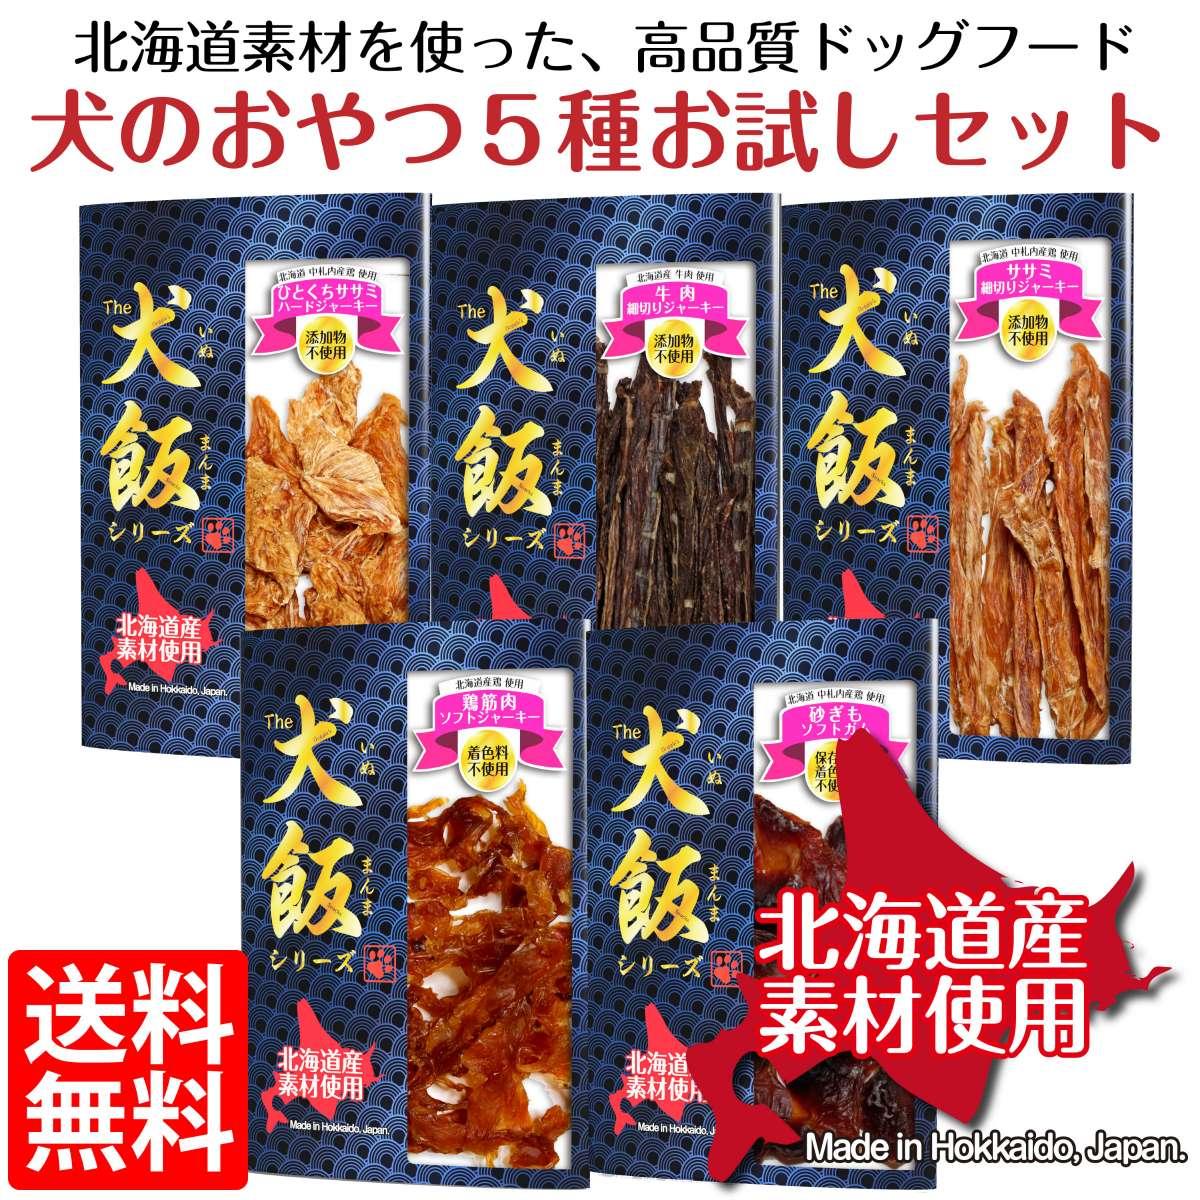 325g 【メール便 送料無料】 犬服犬服 犬 ドッグ犬服 犬のおやつ 北海道産 ドッグフード お試し 5種類セット 鶏肉 牛肉 ジャーキー 犬飯(いぬまんま)